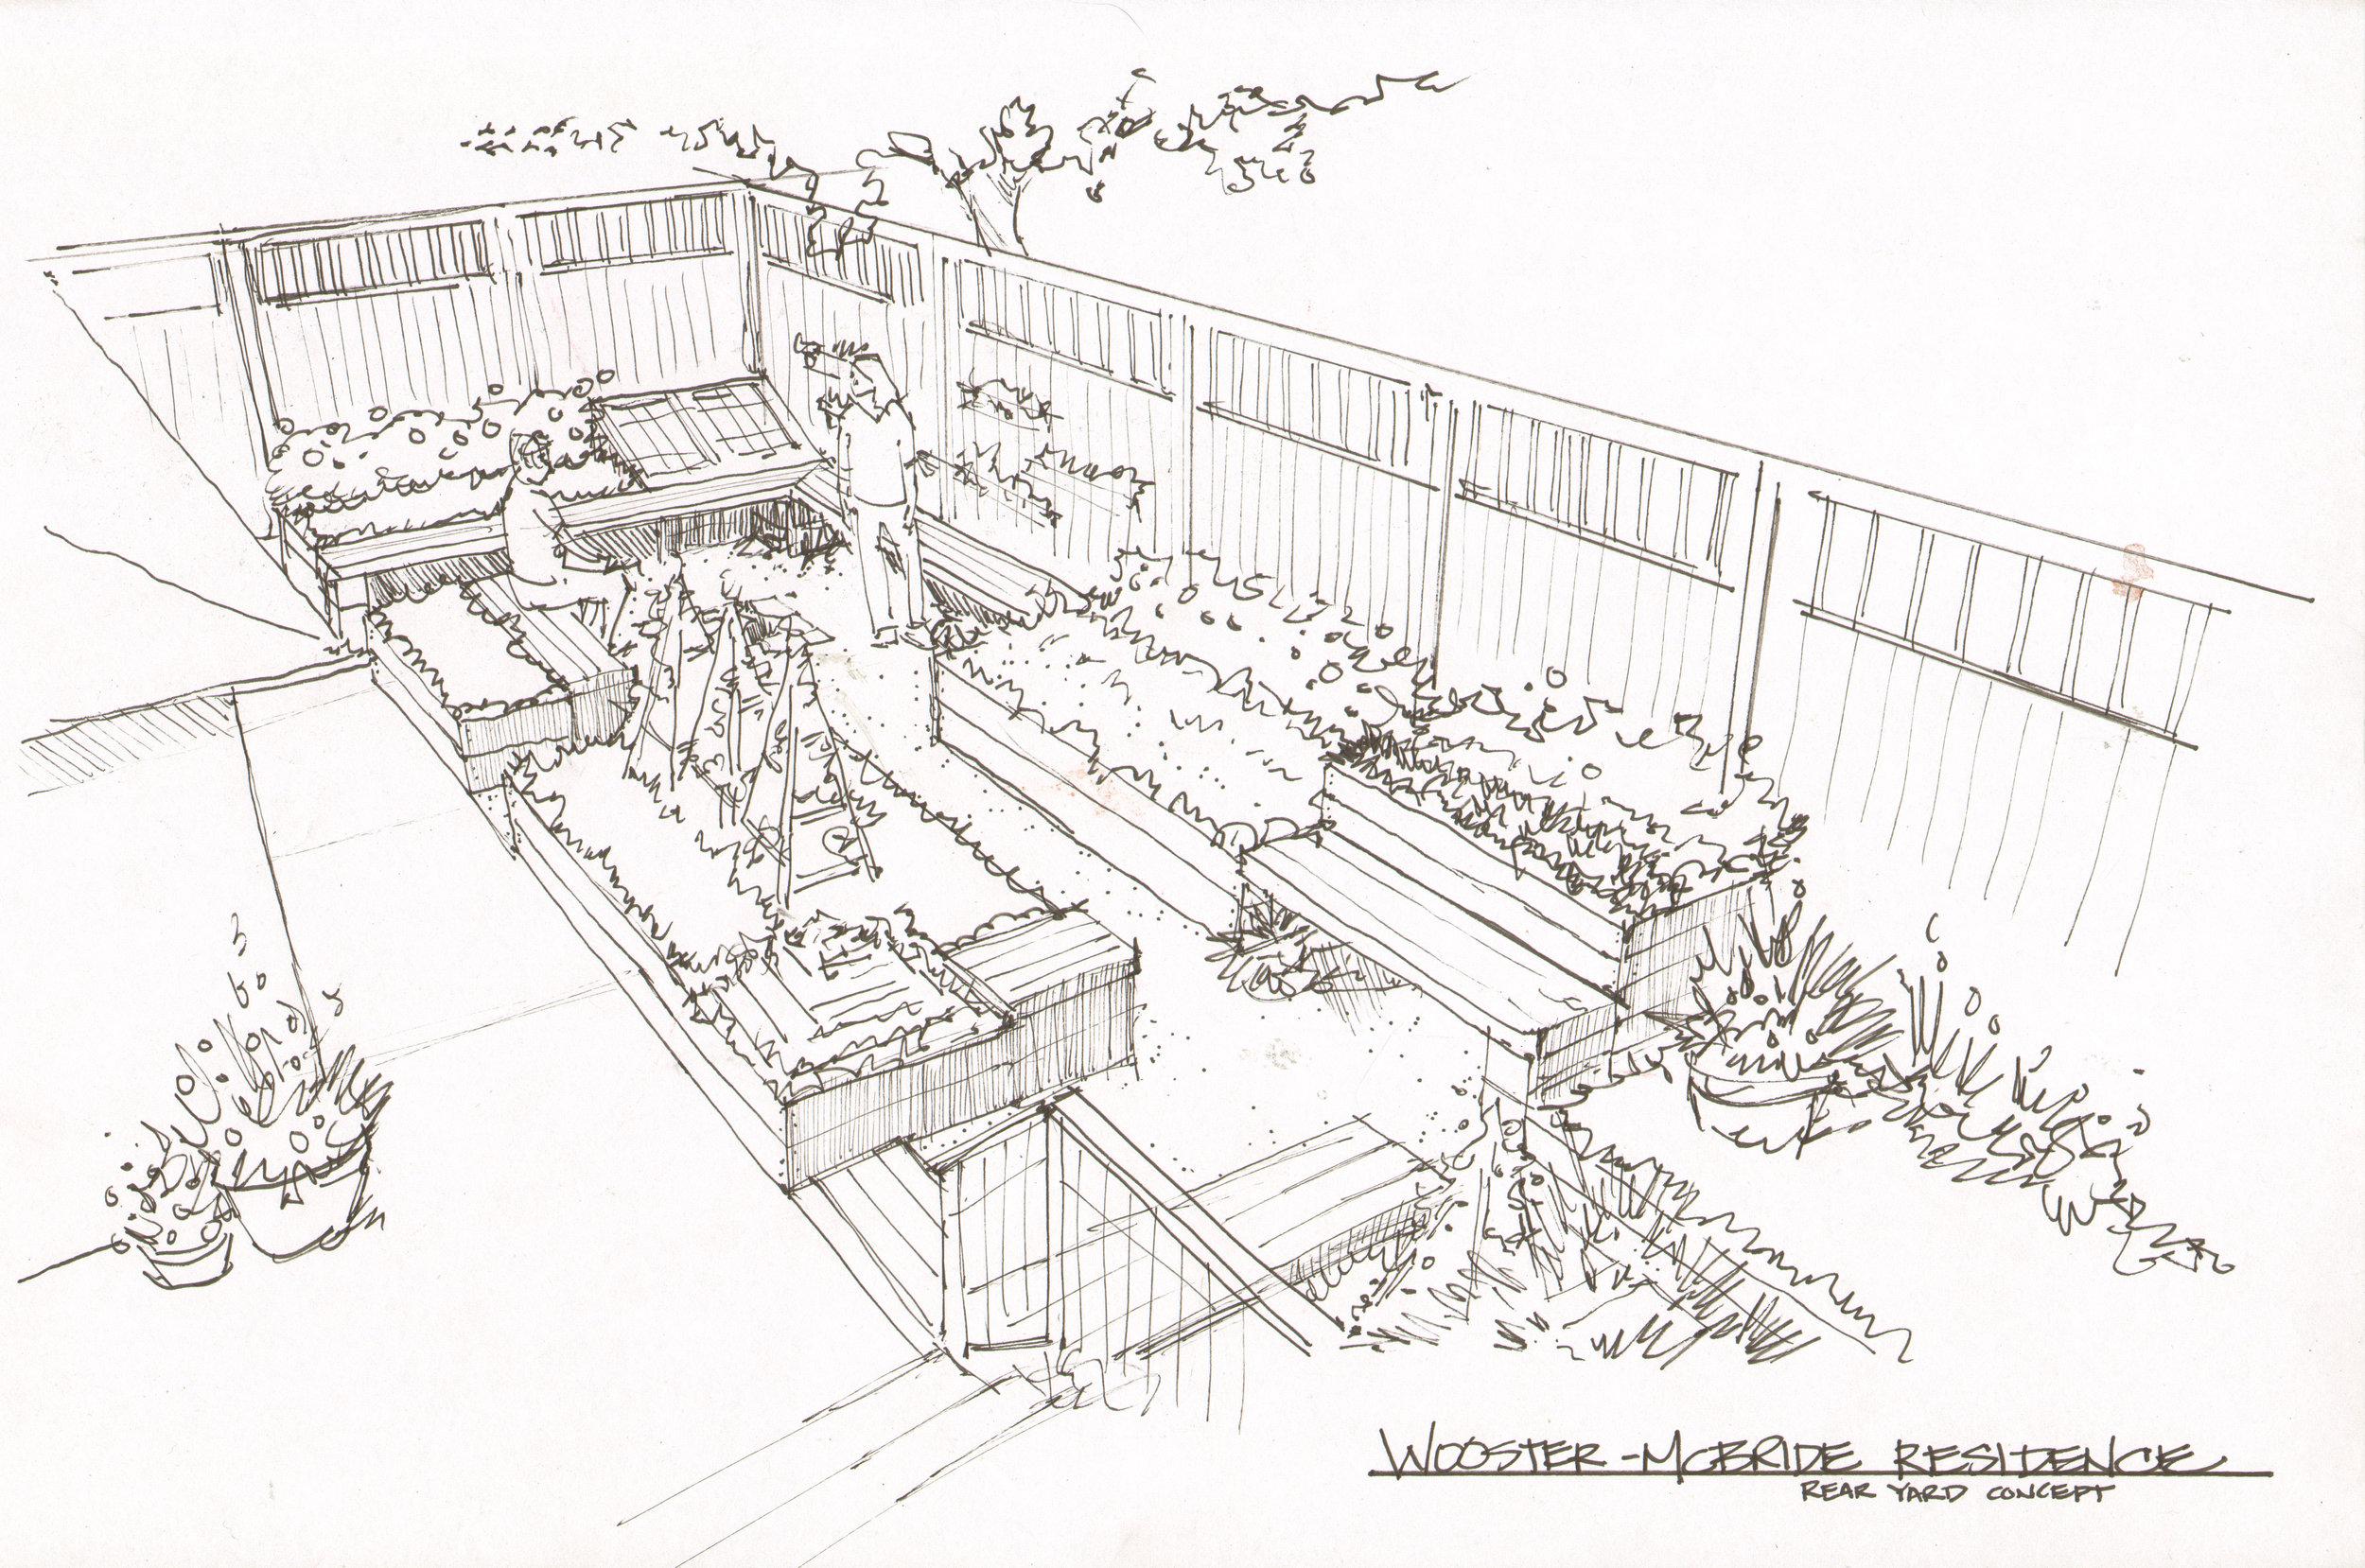 1 Wooster Mcbride perspective sketch.jpg